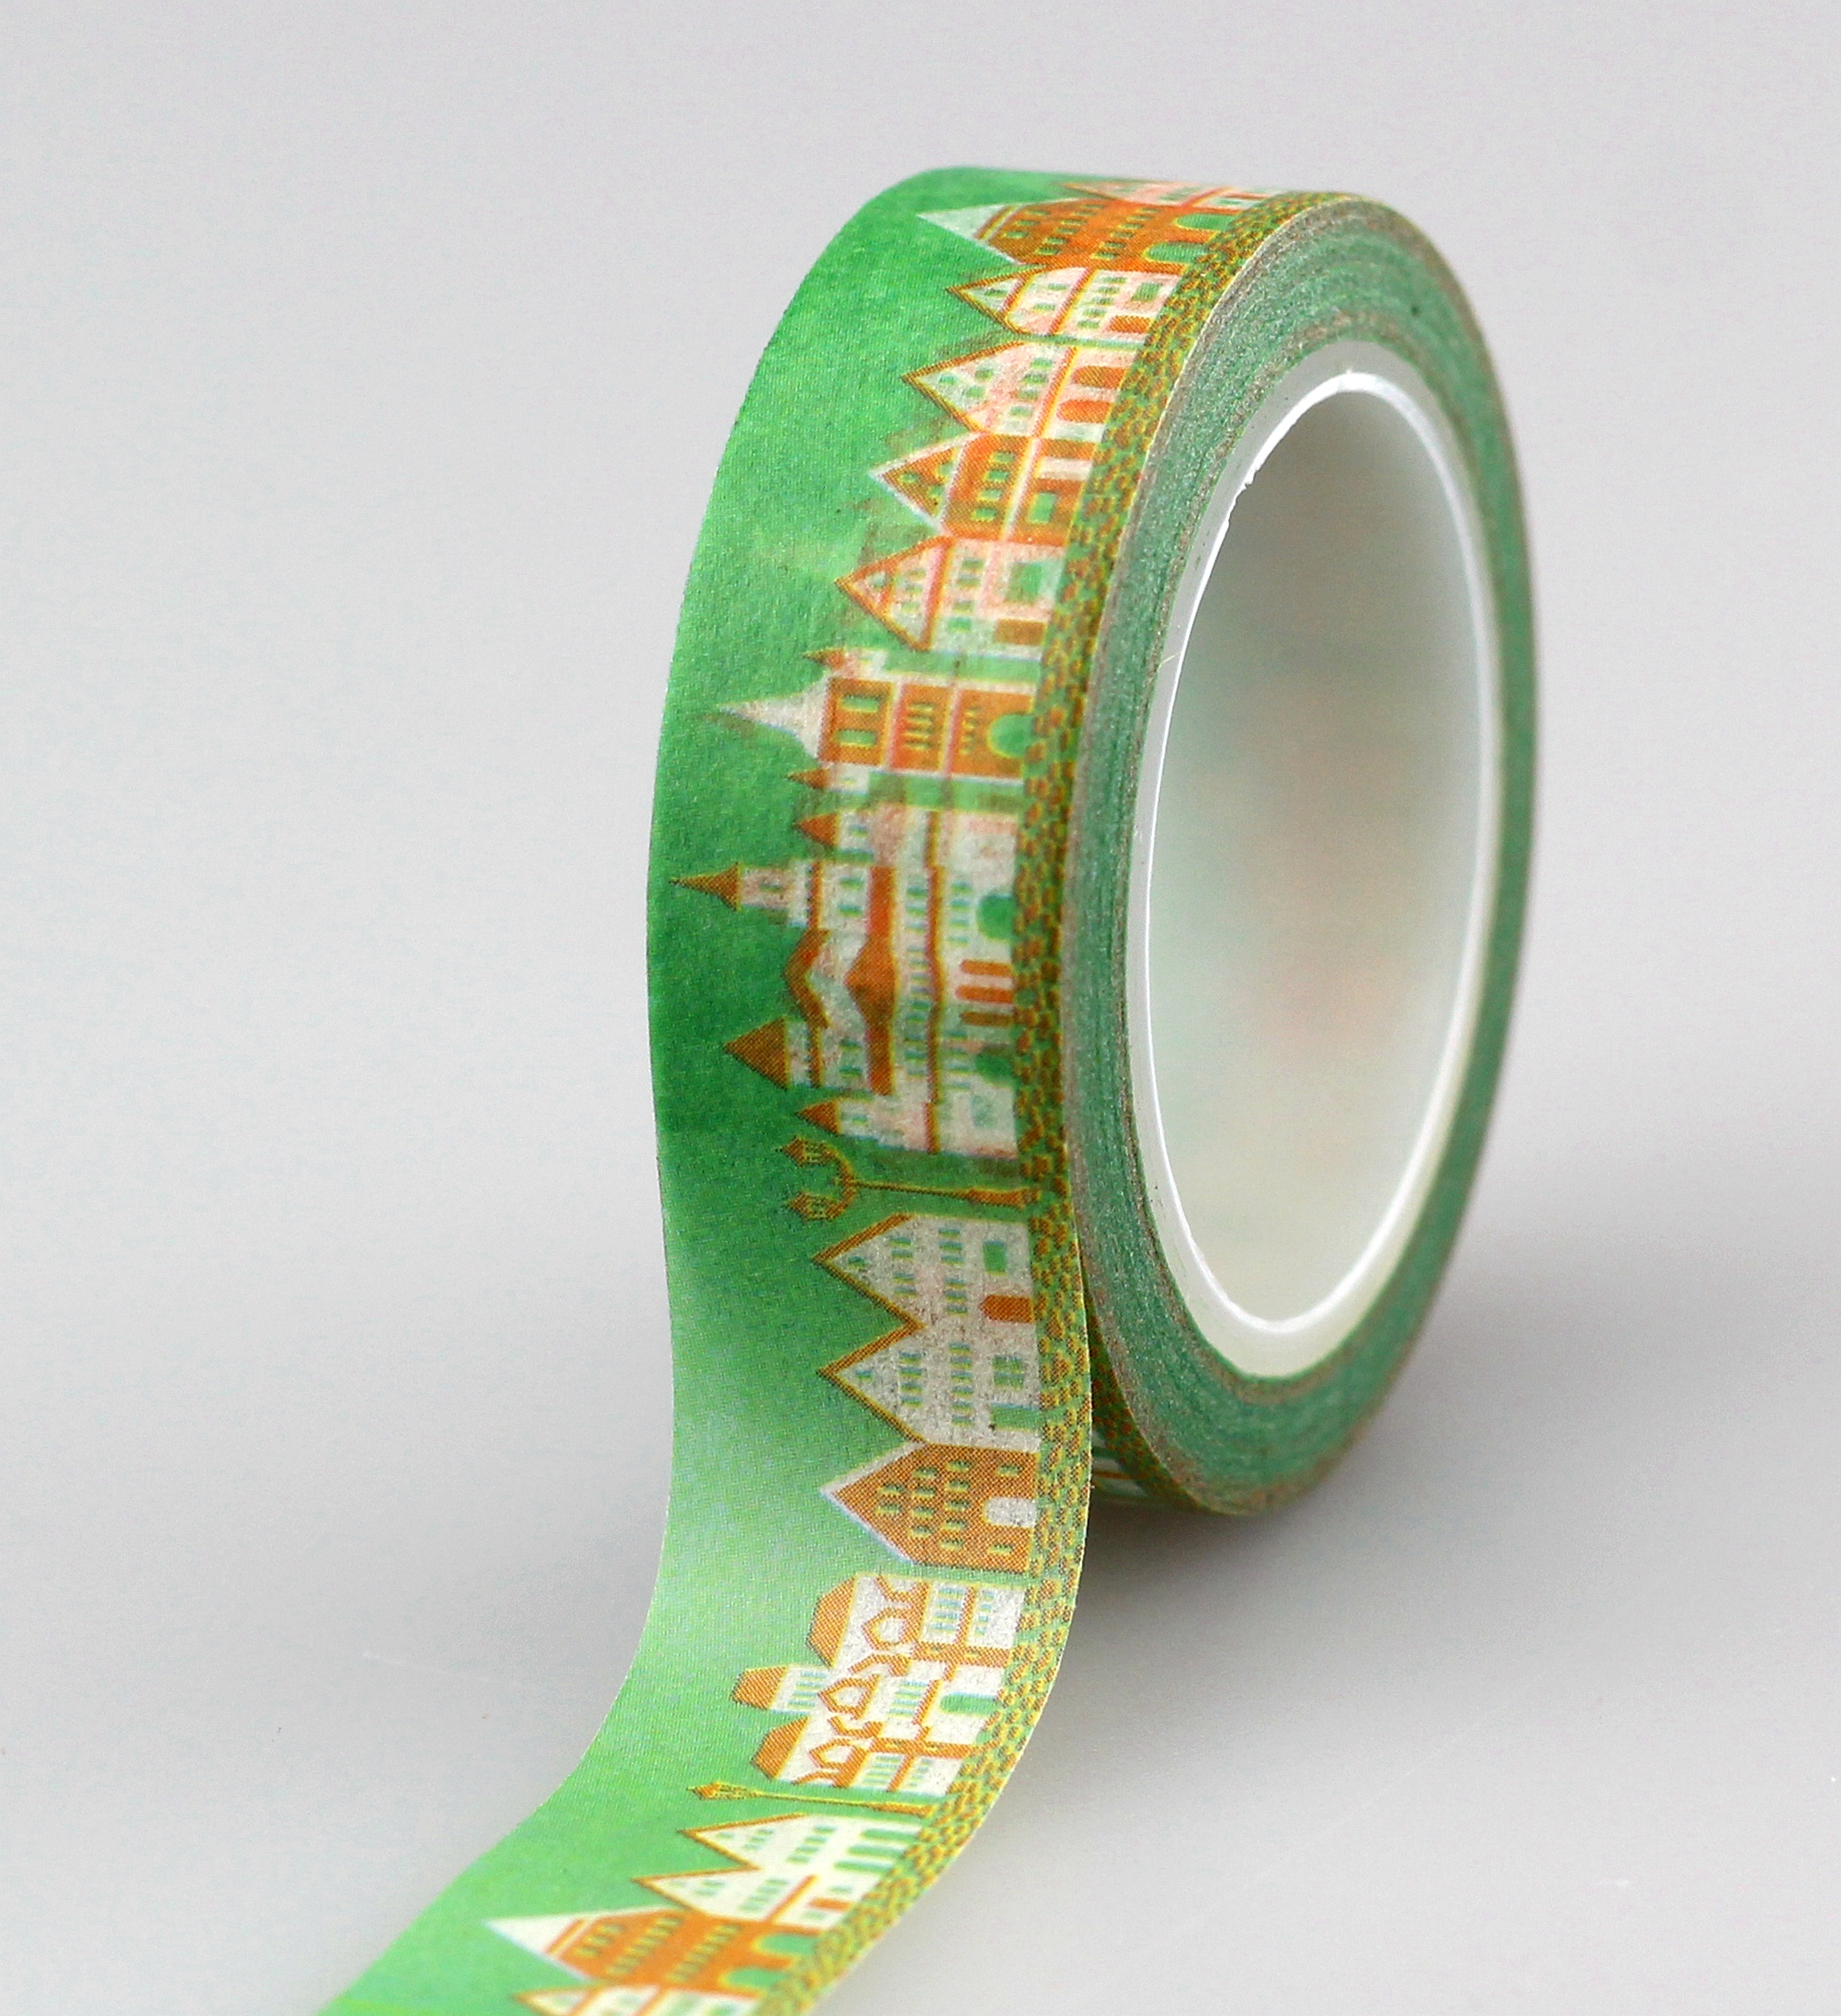 10pcs/lot Decorative Cute Village Washi Tapes Paper DIY Scrapbooking Planner Adhesive Masking Tapes Kawaii Stationery